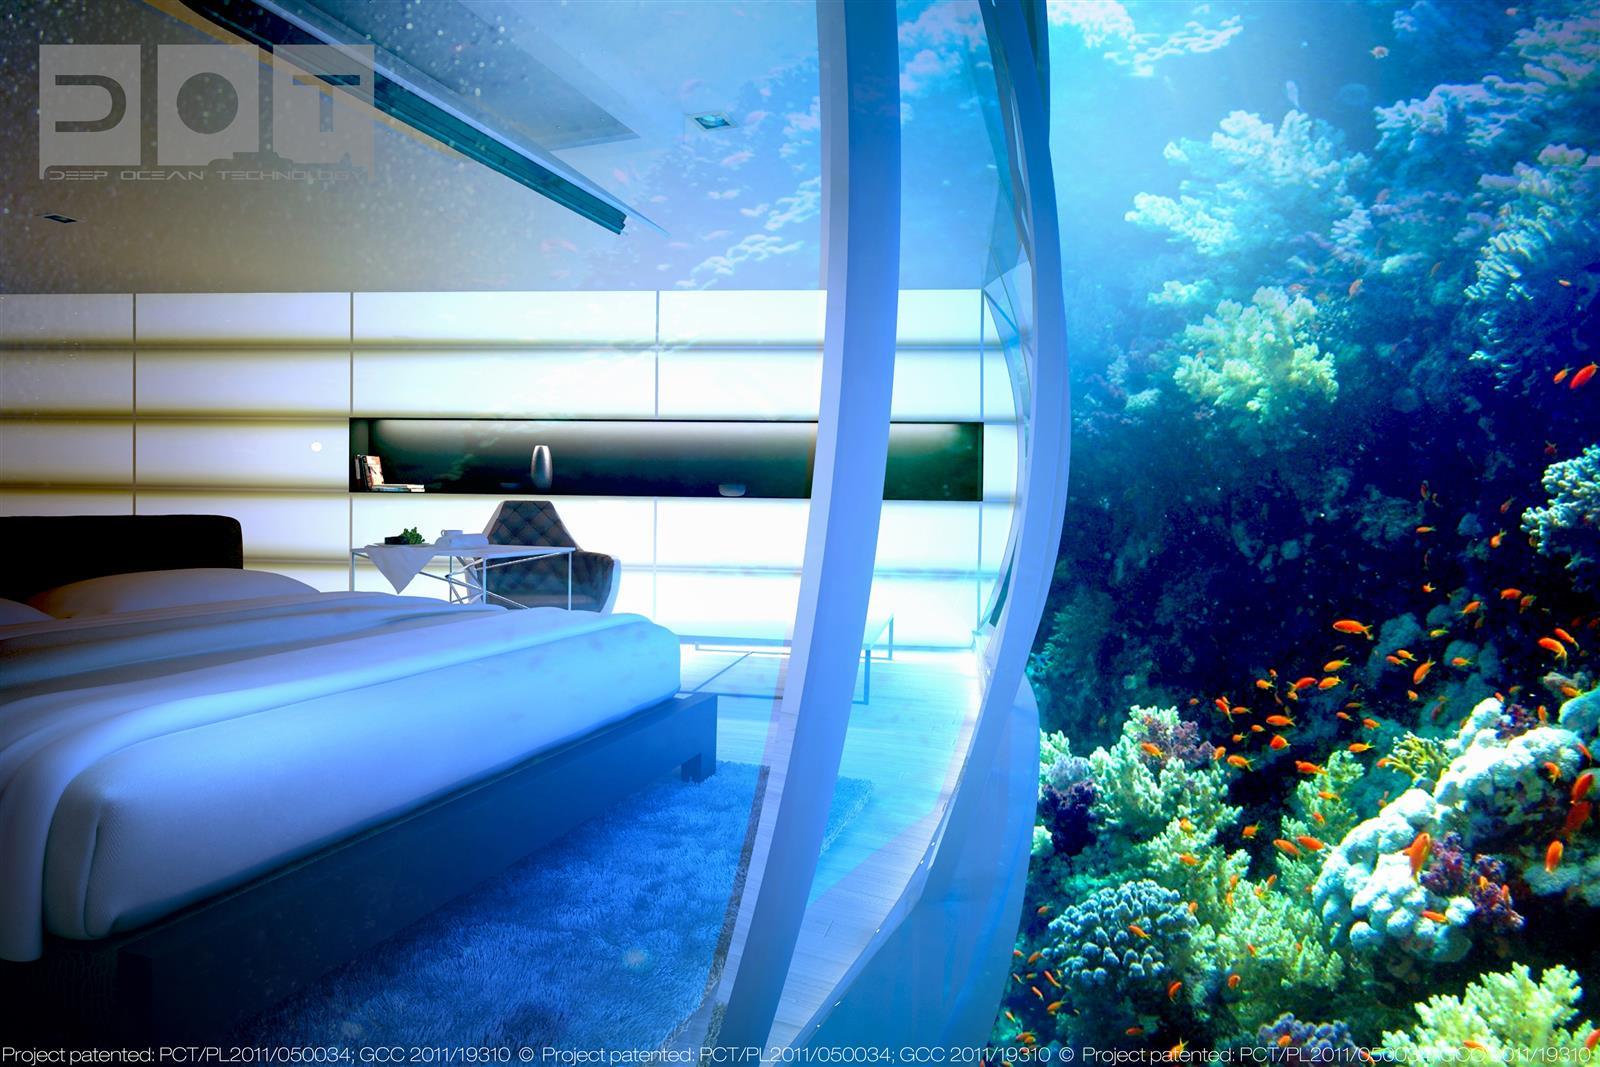 Water Discus Underwater Hotels In Dubai (8)